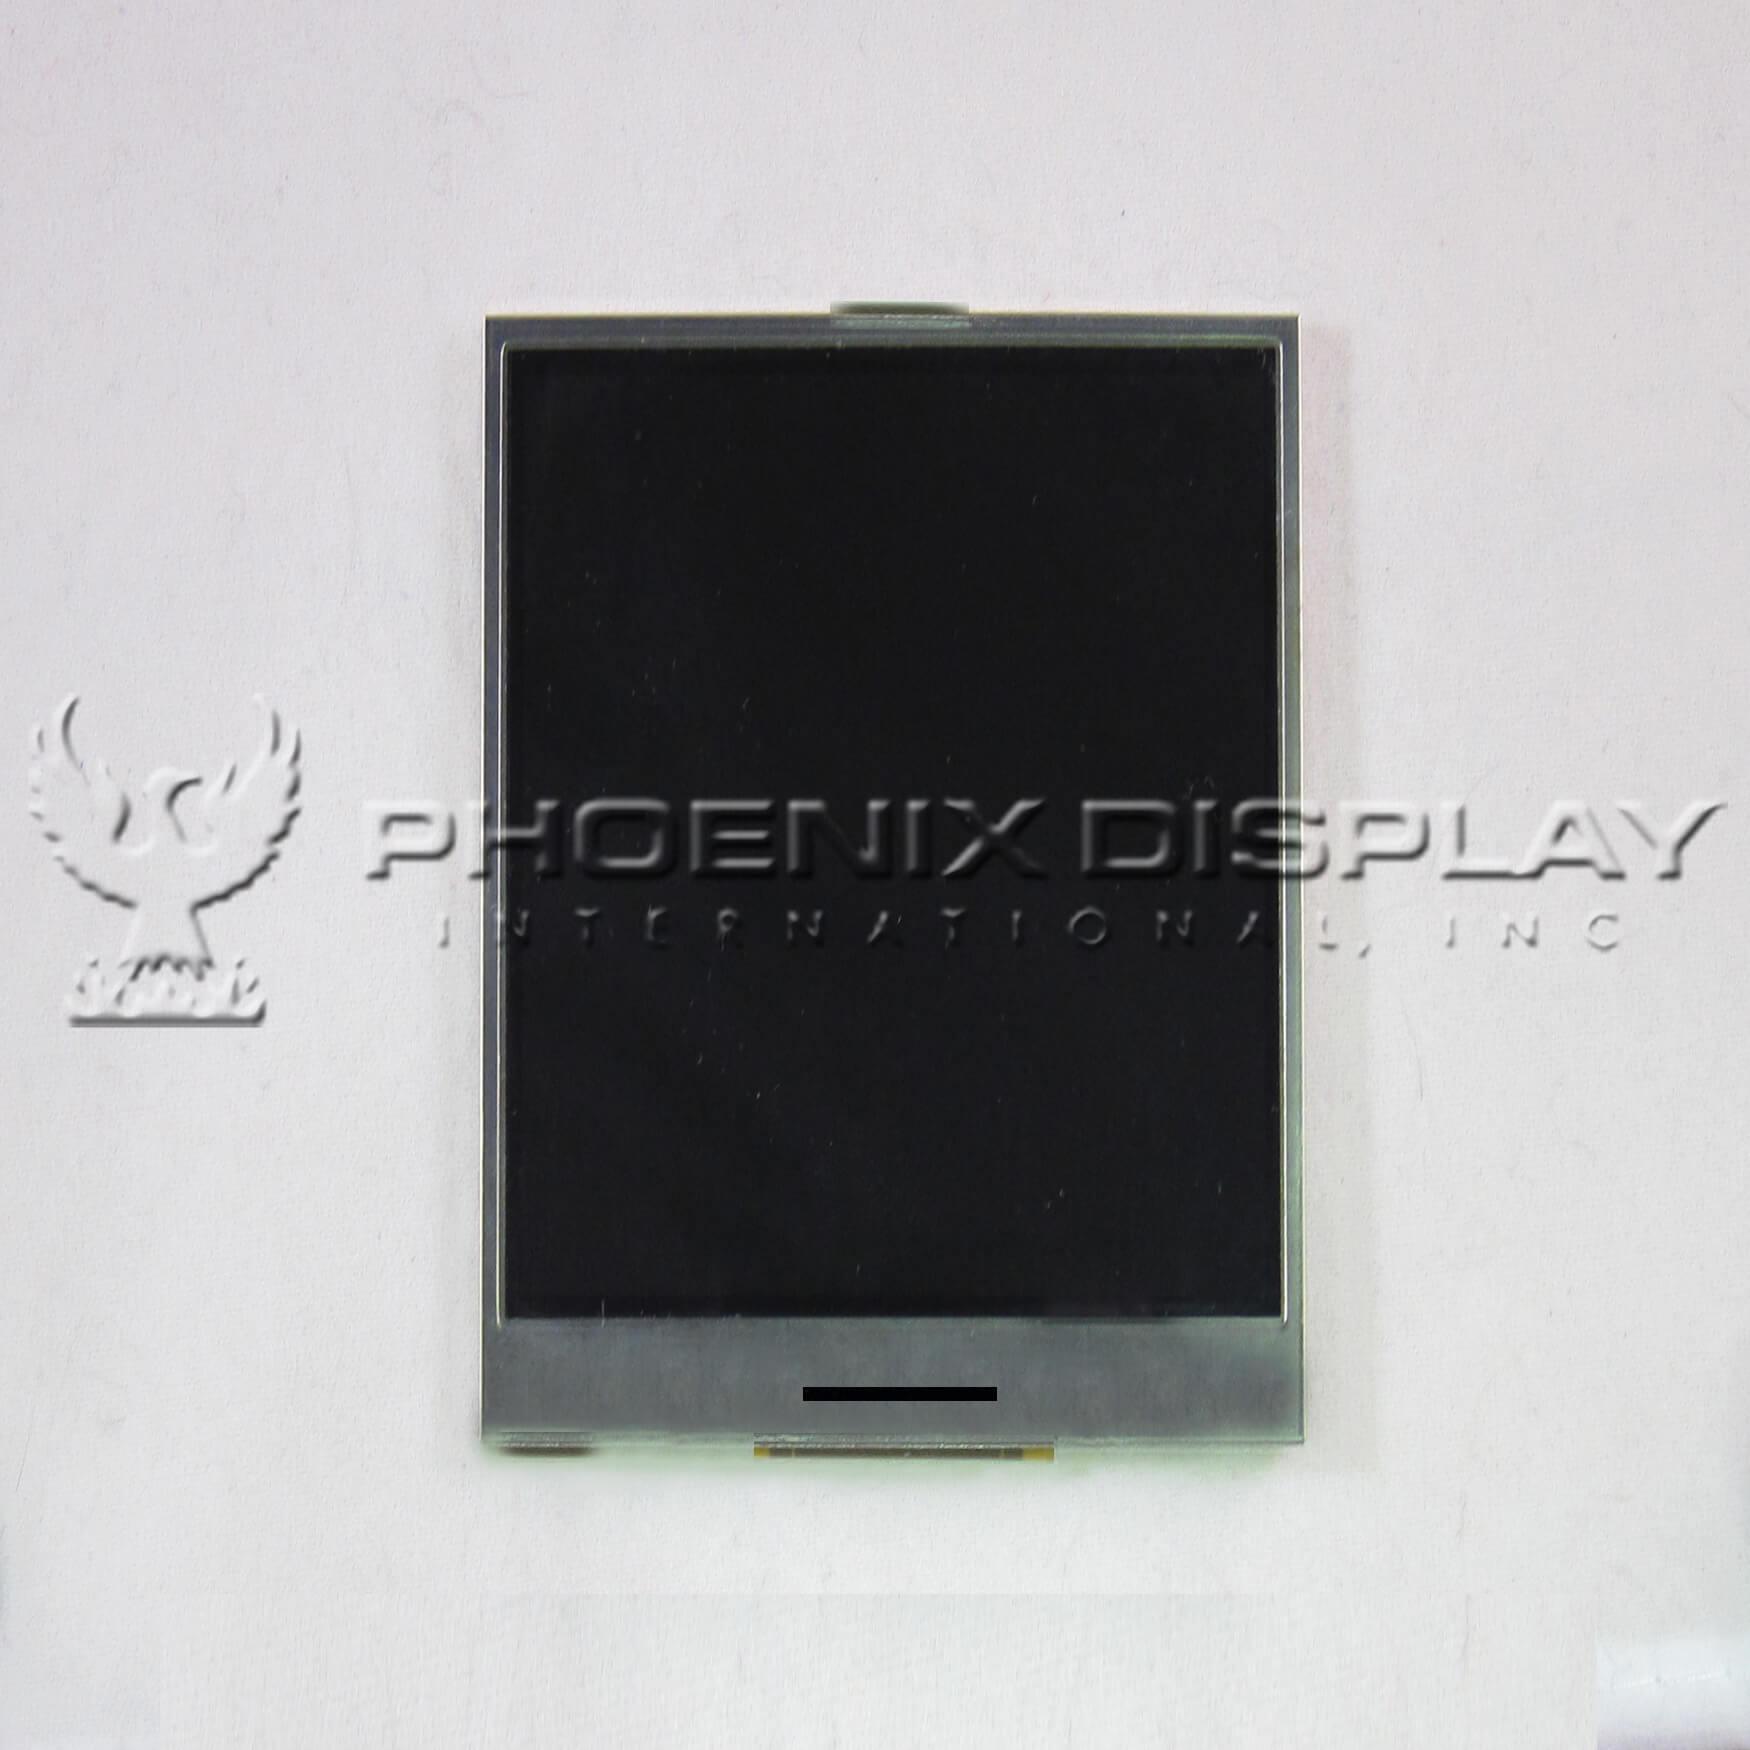 5.0? 320x240 Transflective Color TFT Display